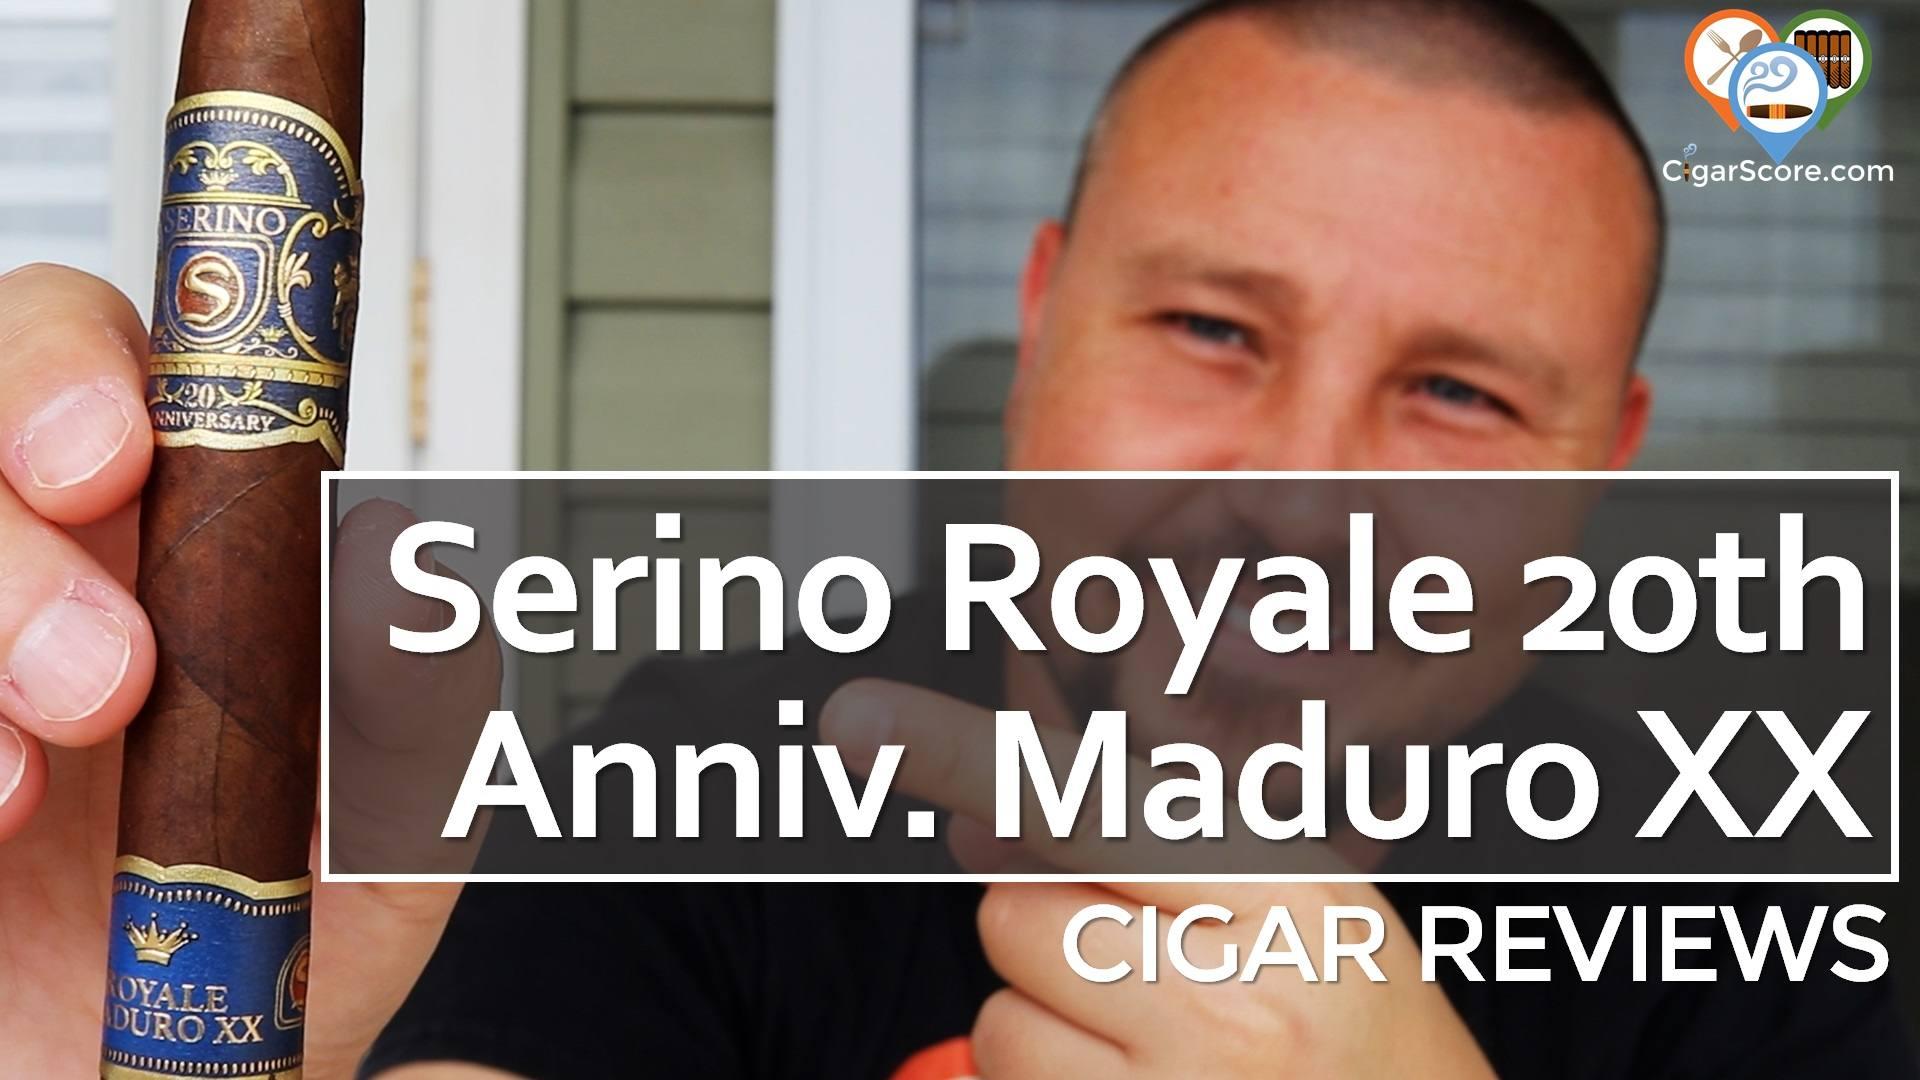 Cigar Review Serino Royale 20th Anniversary Maduro XX Belicoso